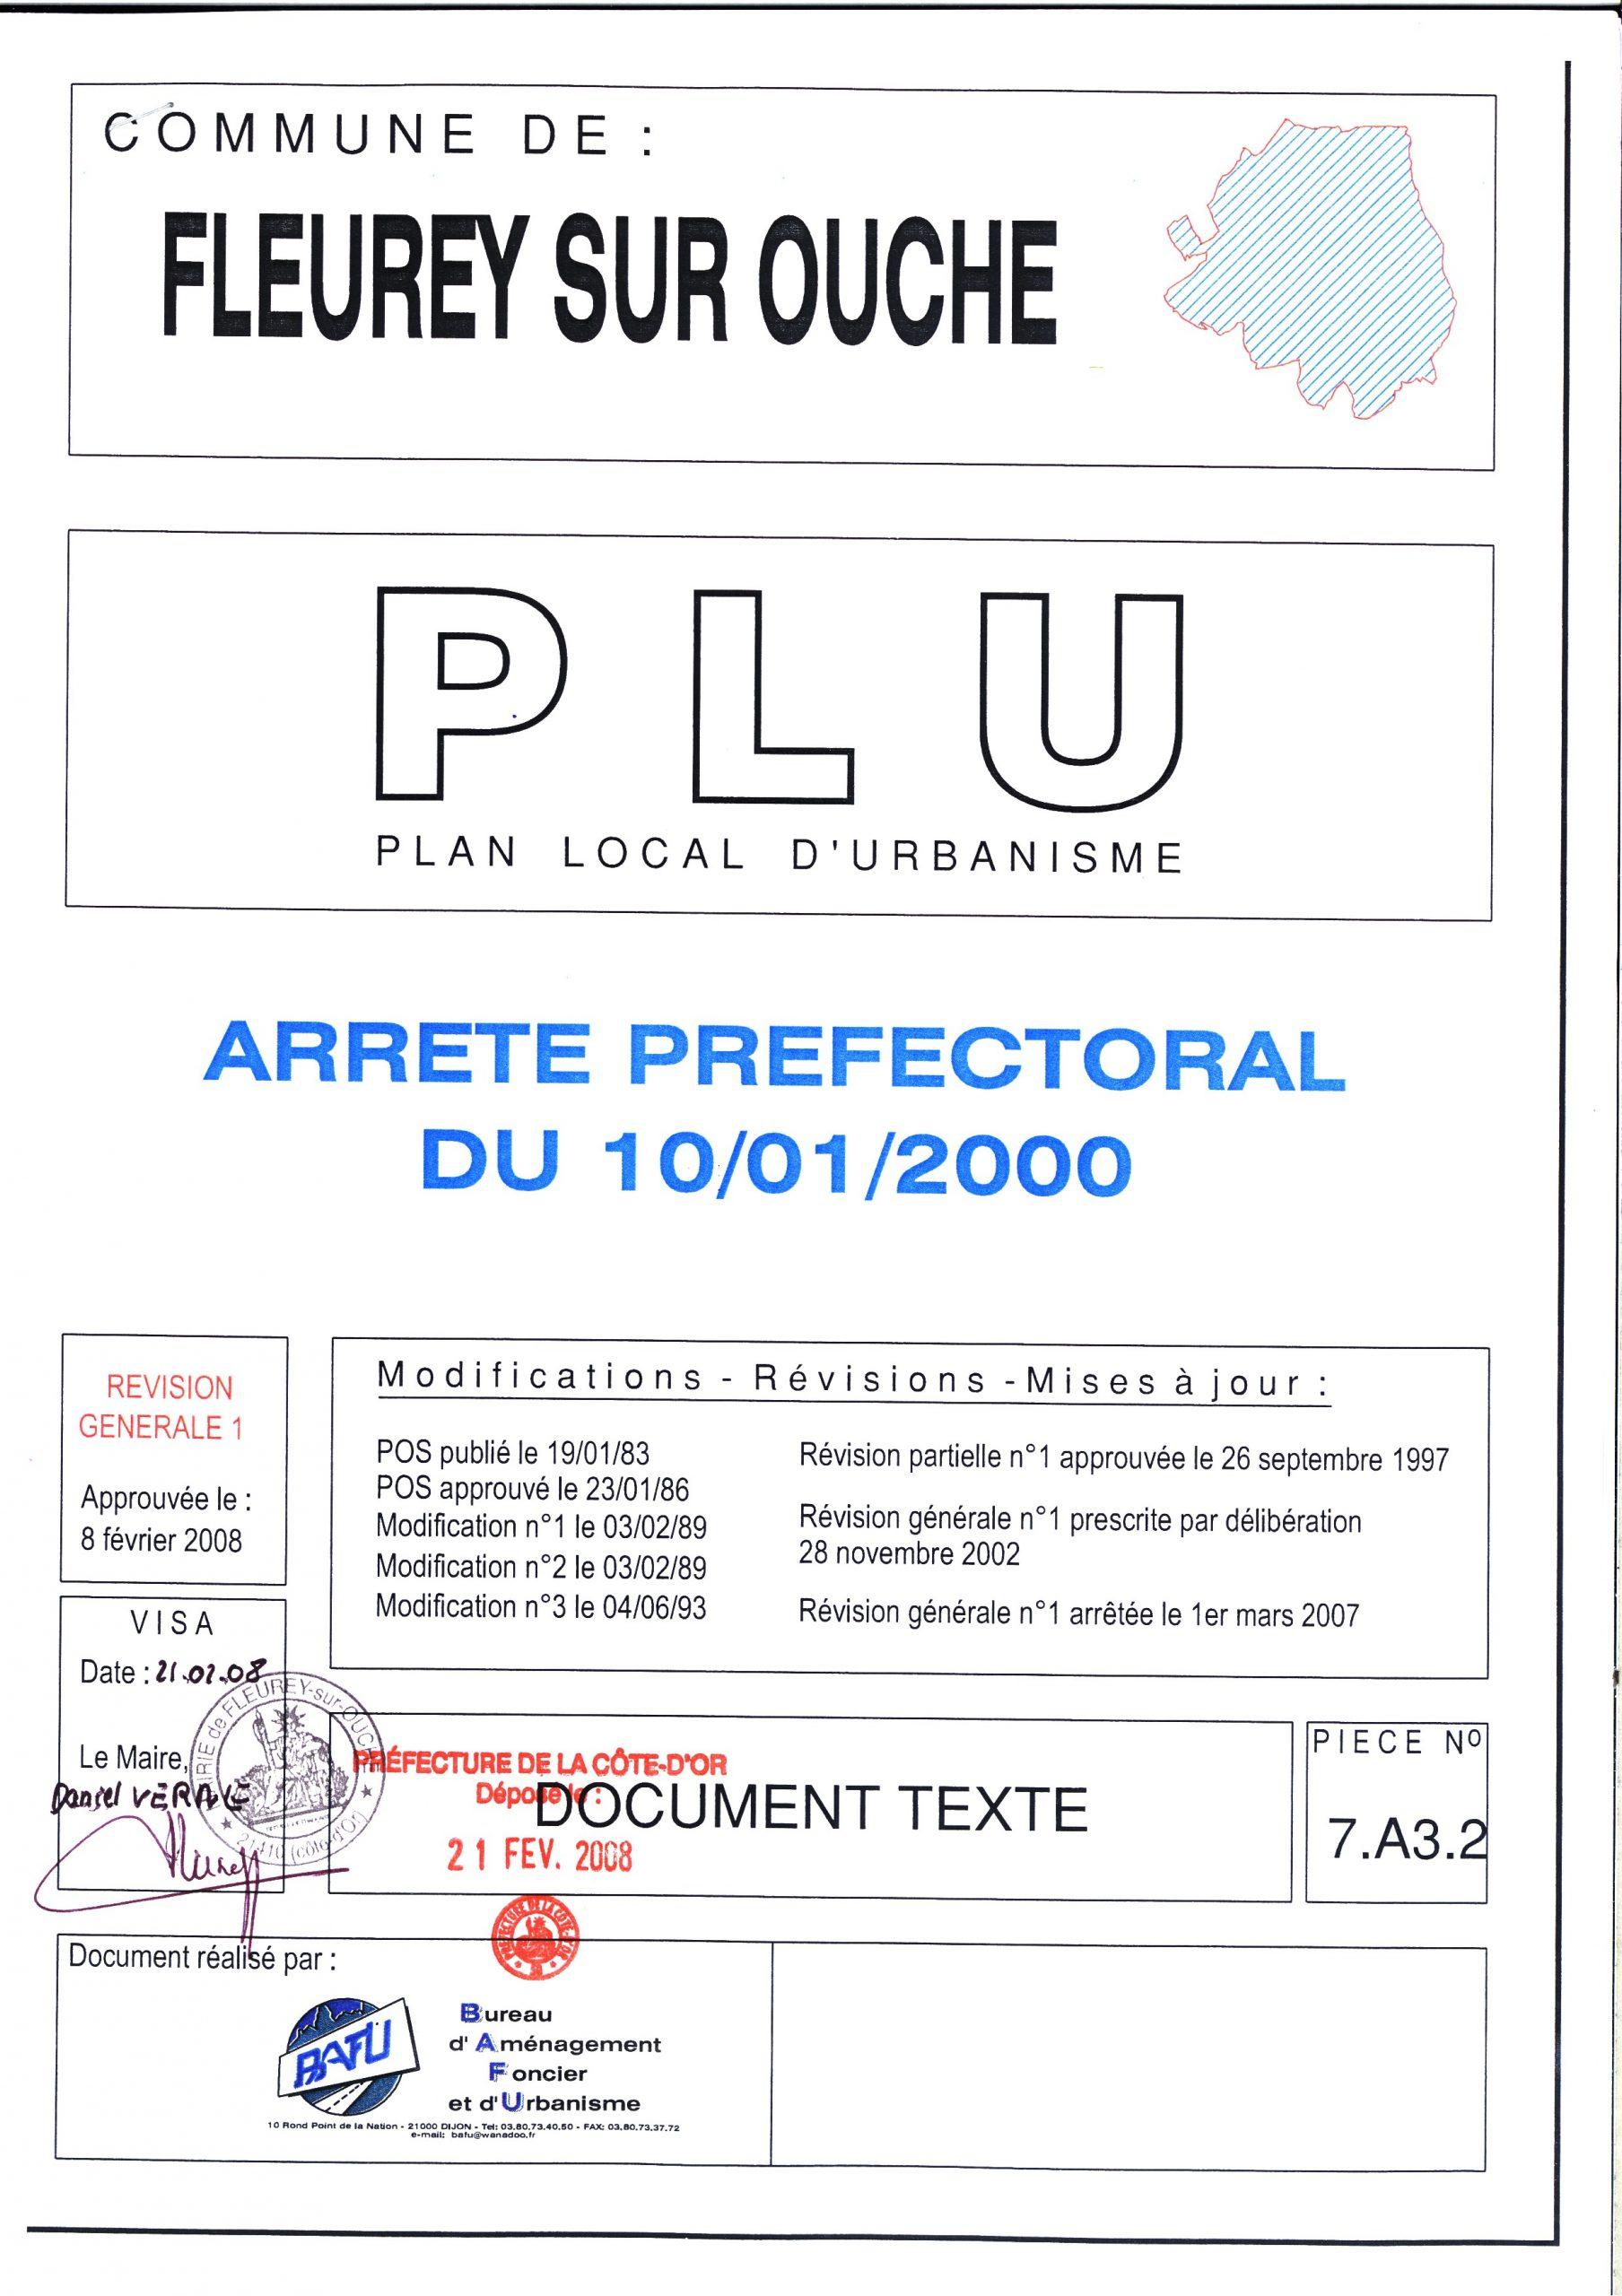 pdg arrete prefectoral 10 01 2000